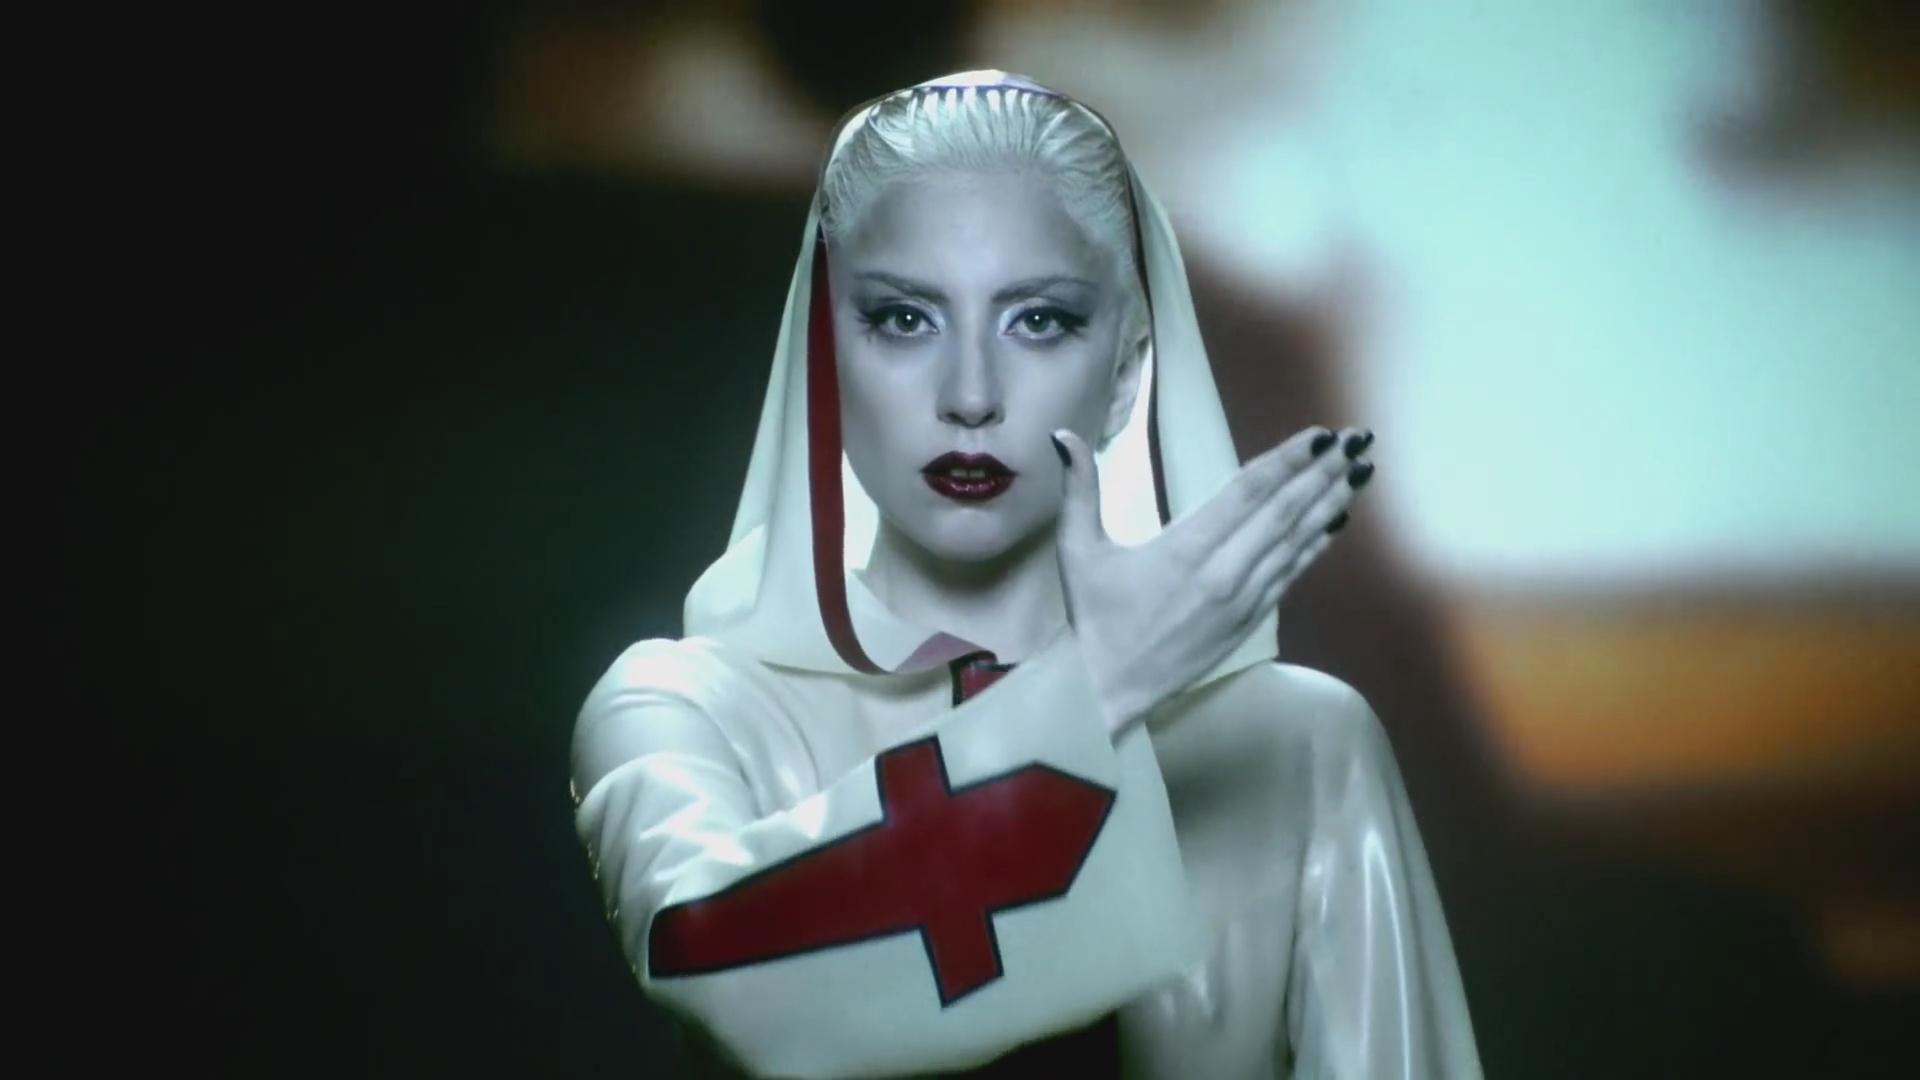 Image - Lady Gaga - Alejandro Music Video 034Jpg  Gagapedia  Fandom Powered By Wikia-5368